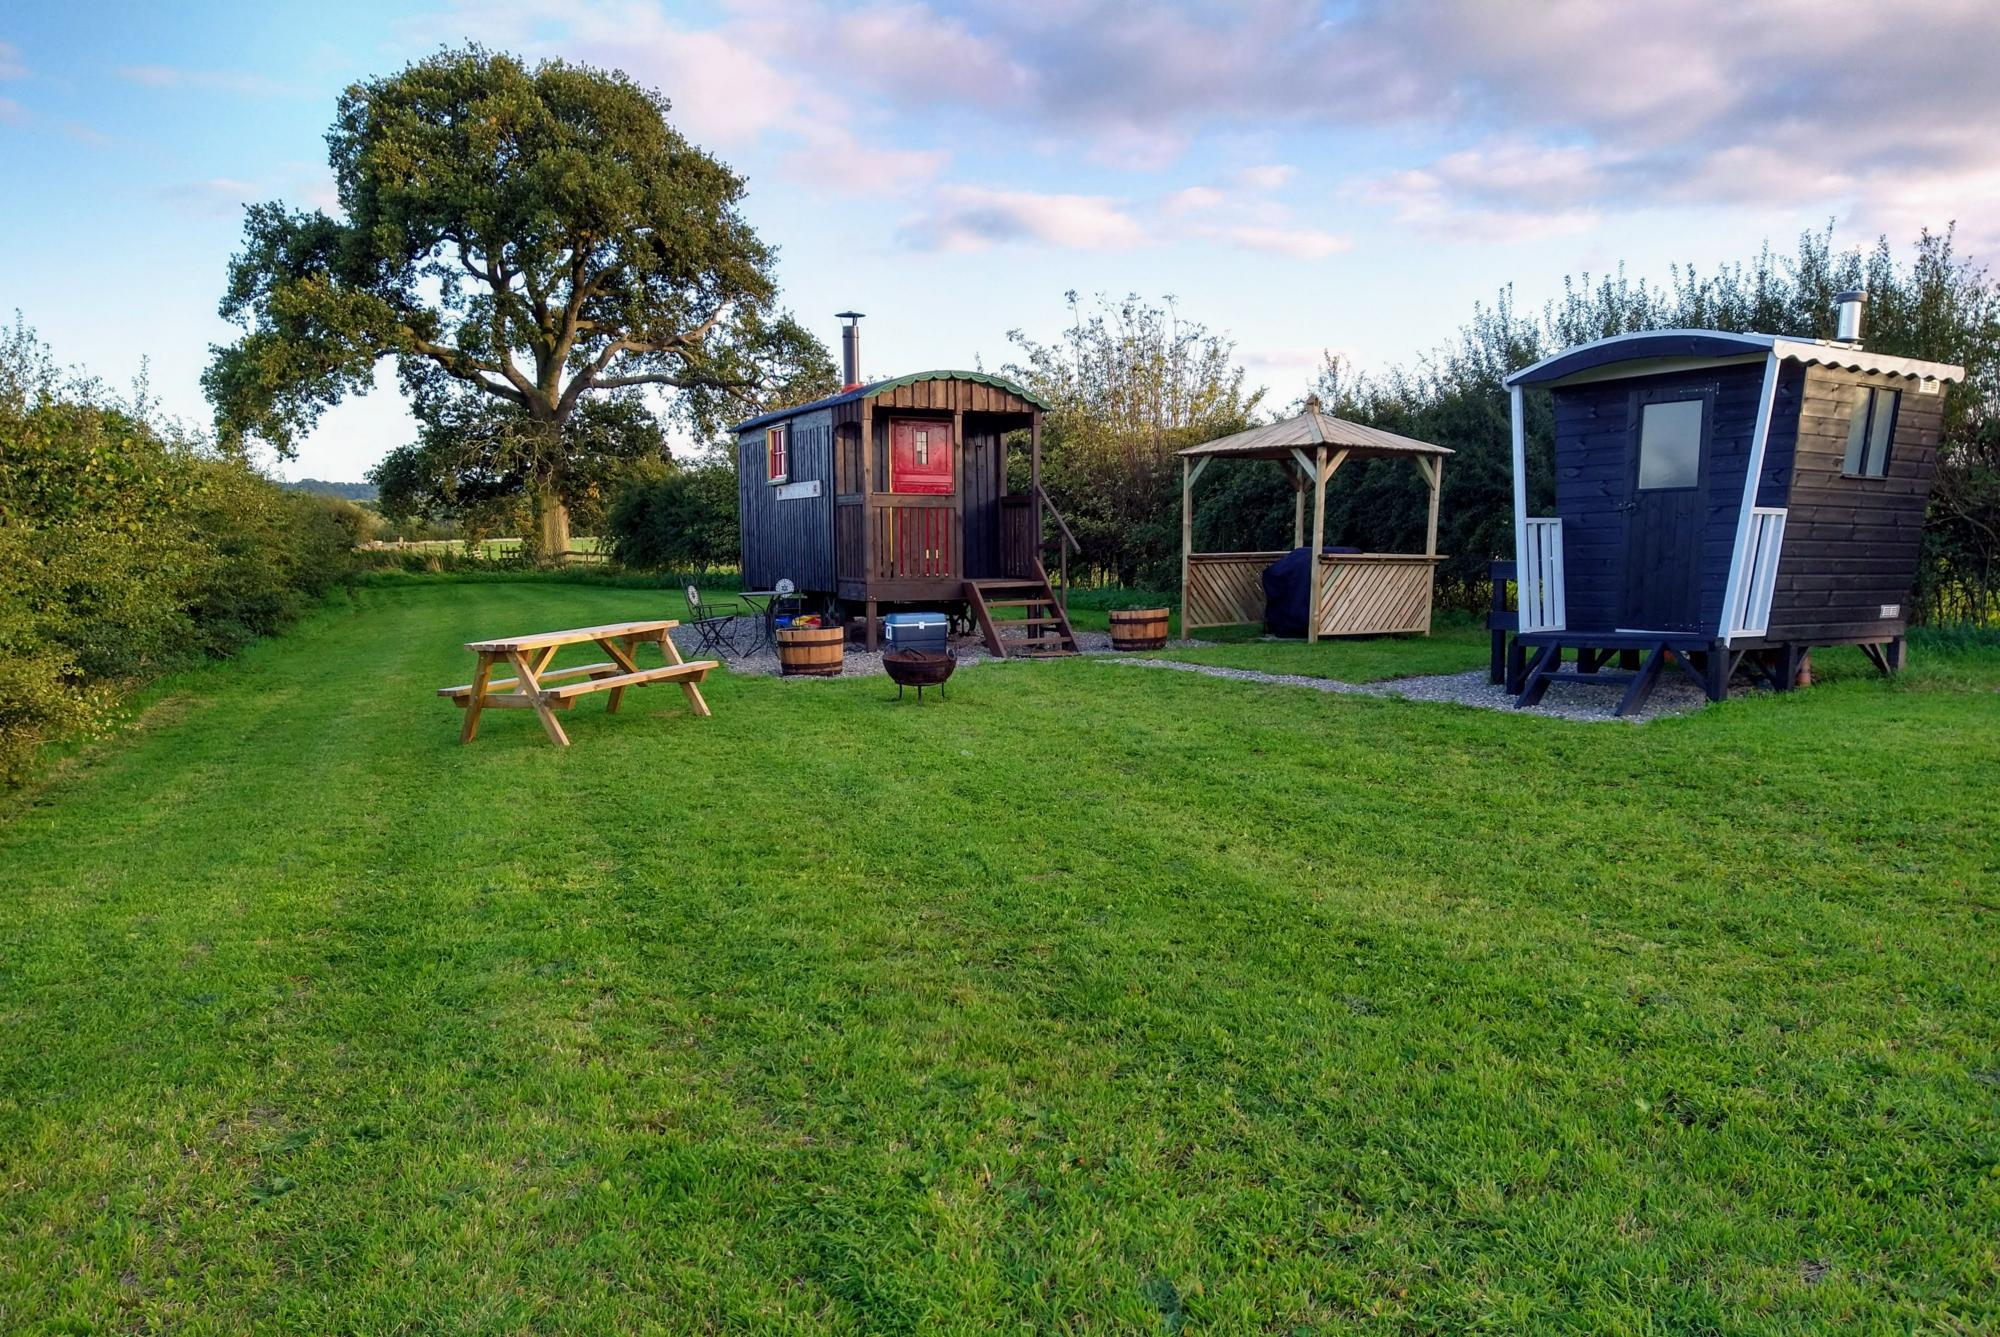 Glamping in Shrewsbury – Cool Camping